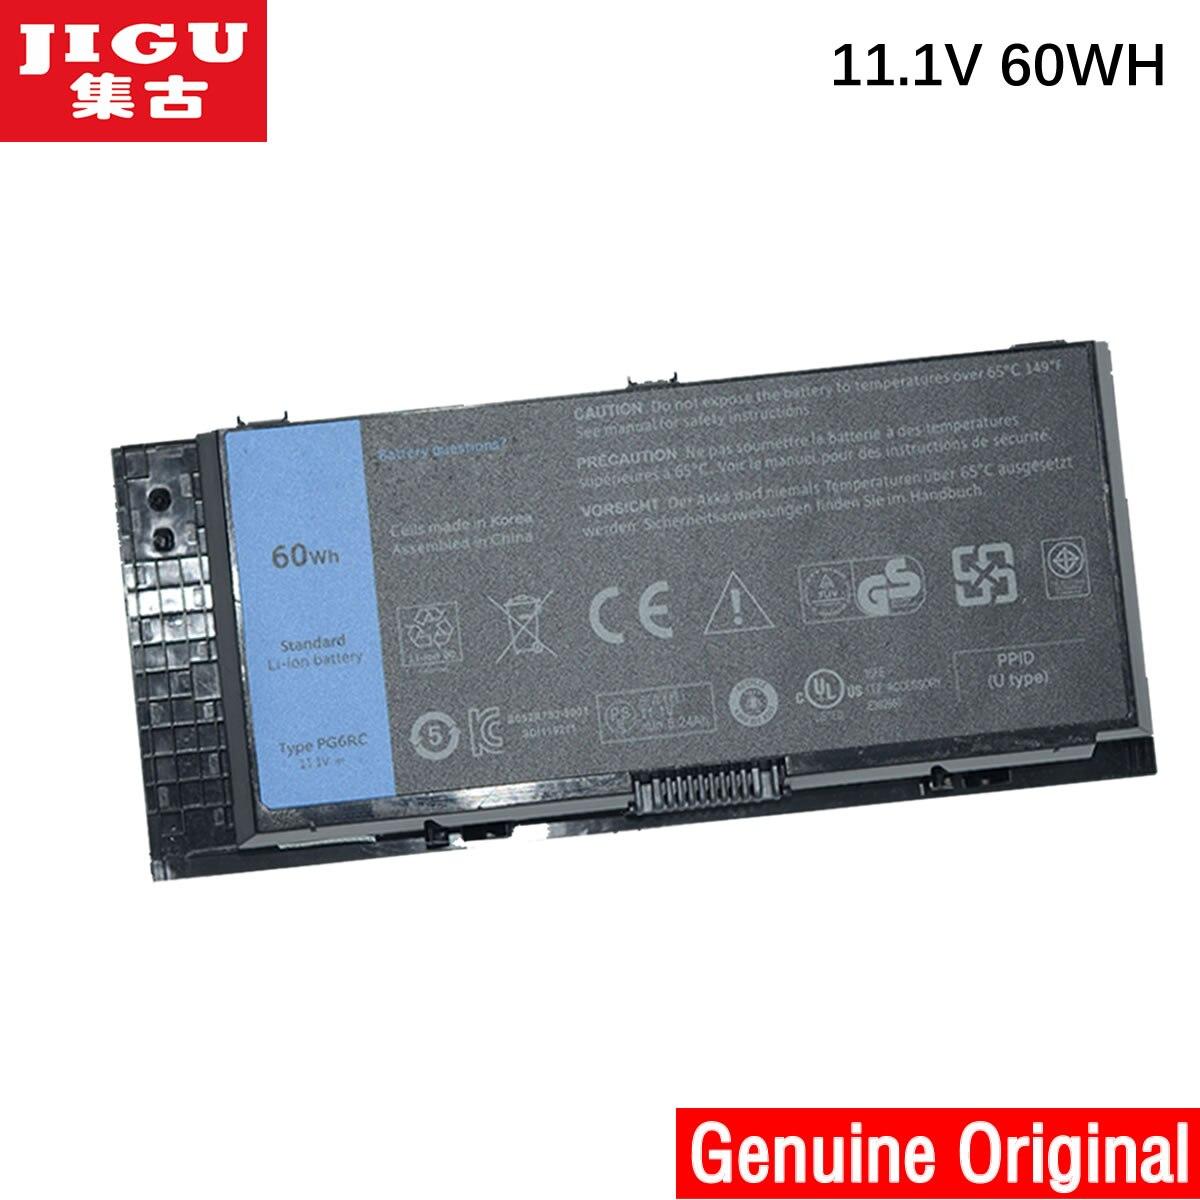 JIGU 0FVWT4 0TN1K5 312-1176 1177 1178 3DJH7 451-11742 11743 97KRM Оригинальный аккумулятор для ноутбука Dell M4600 M4700